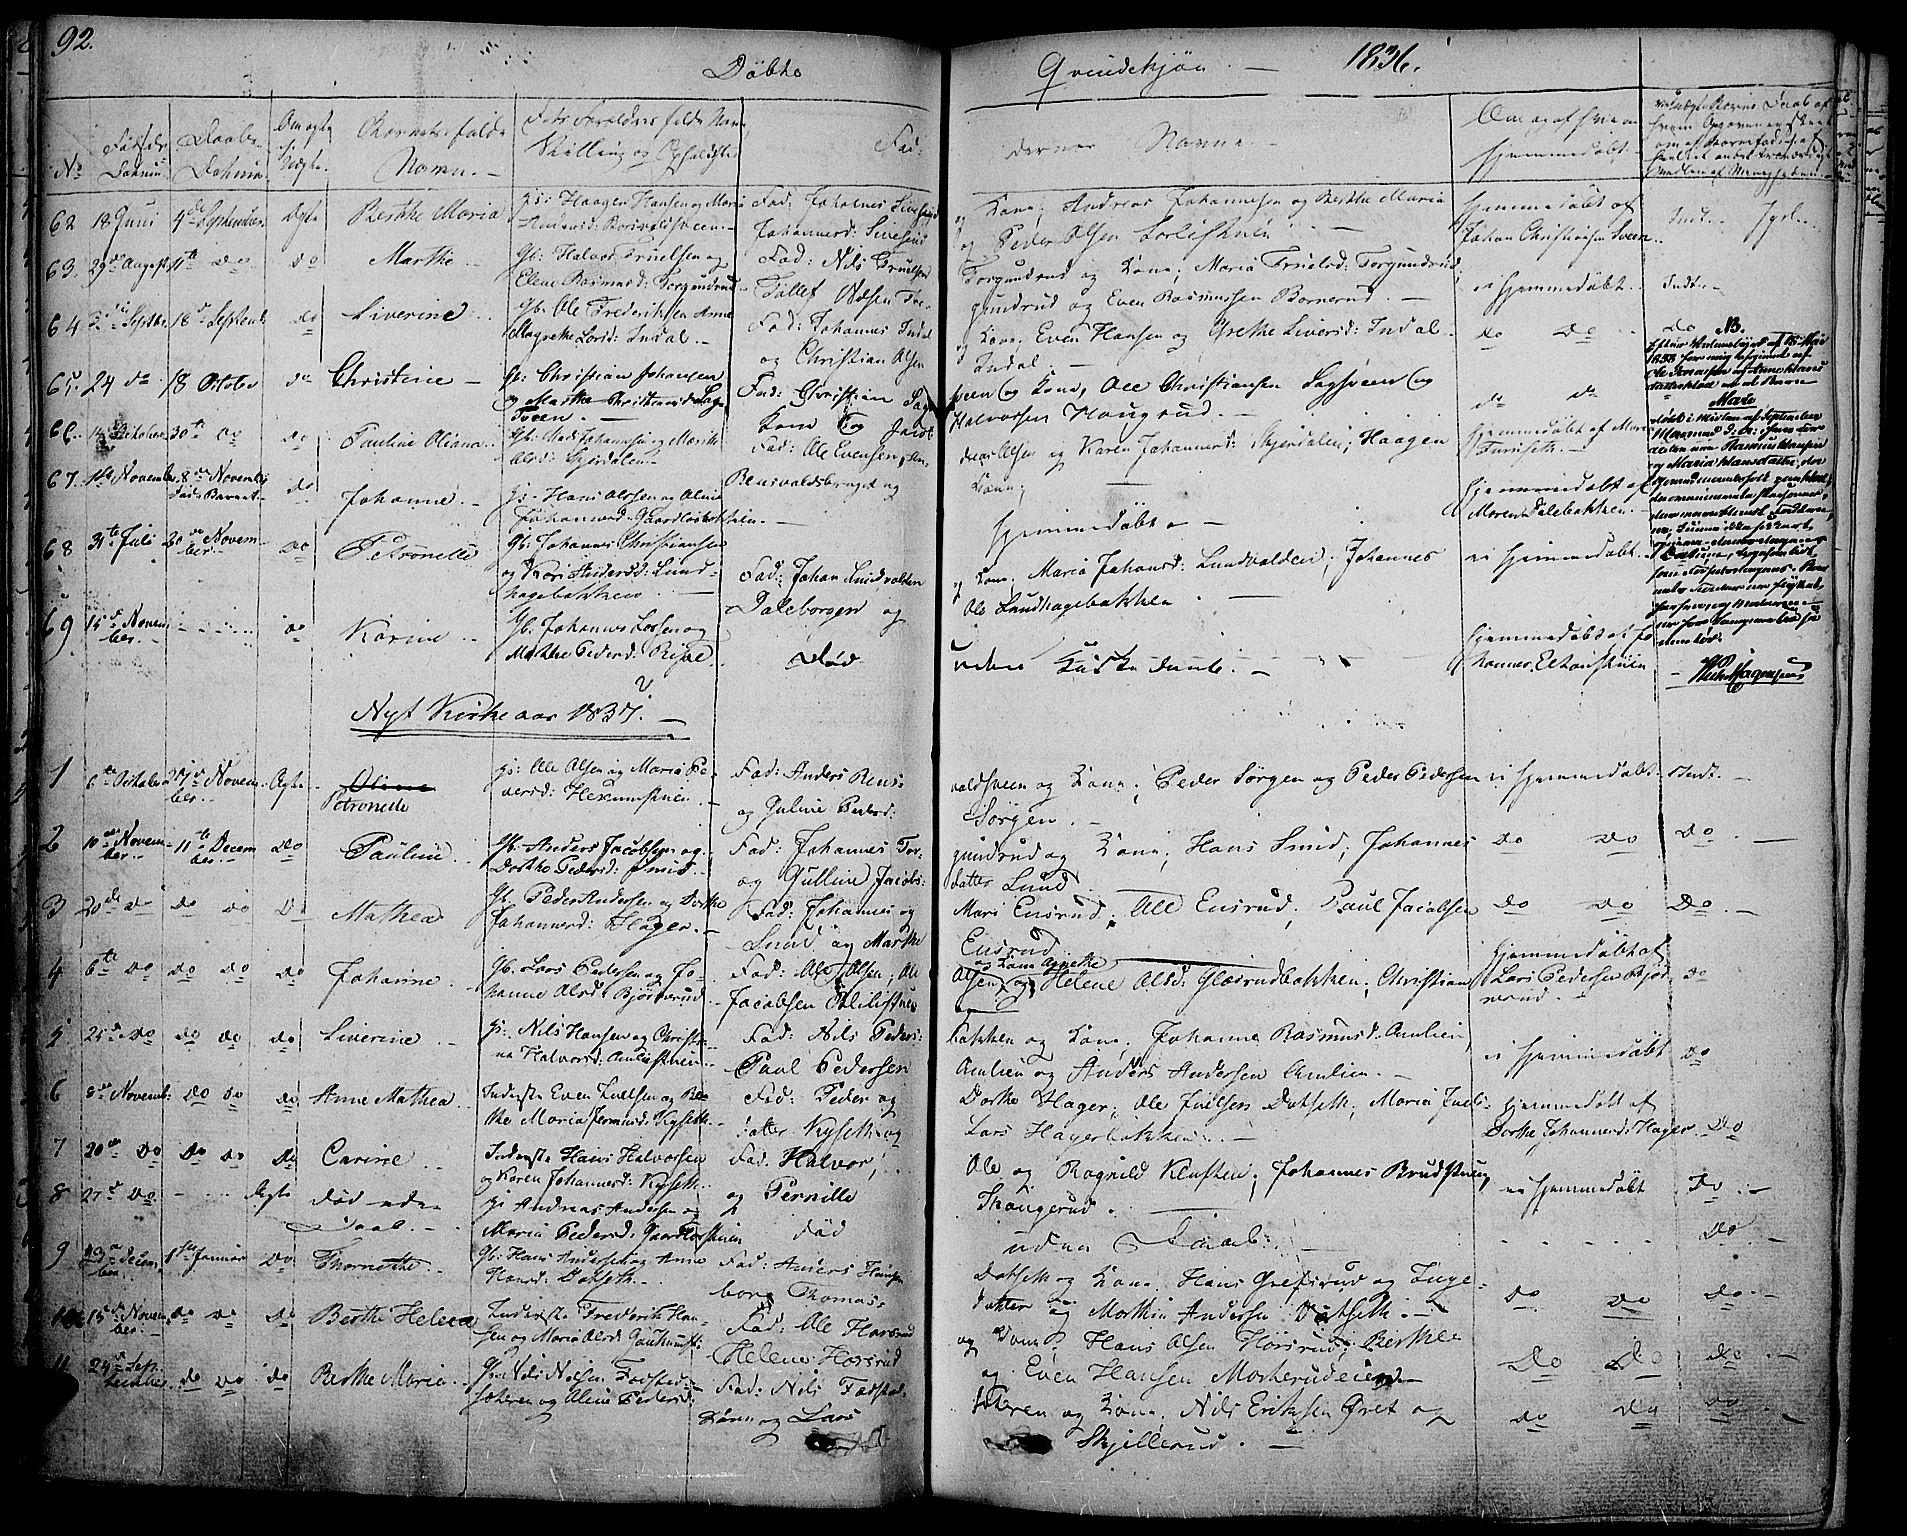 SAH, Vestre Toten prestekontor, H/Ha/Haa/L0002: Ministerialbok nr. 2, 1825-1837, s. 92